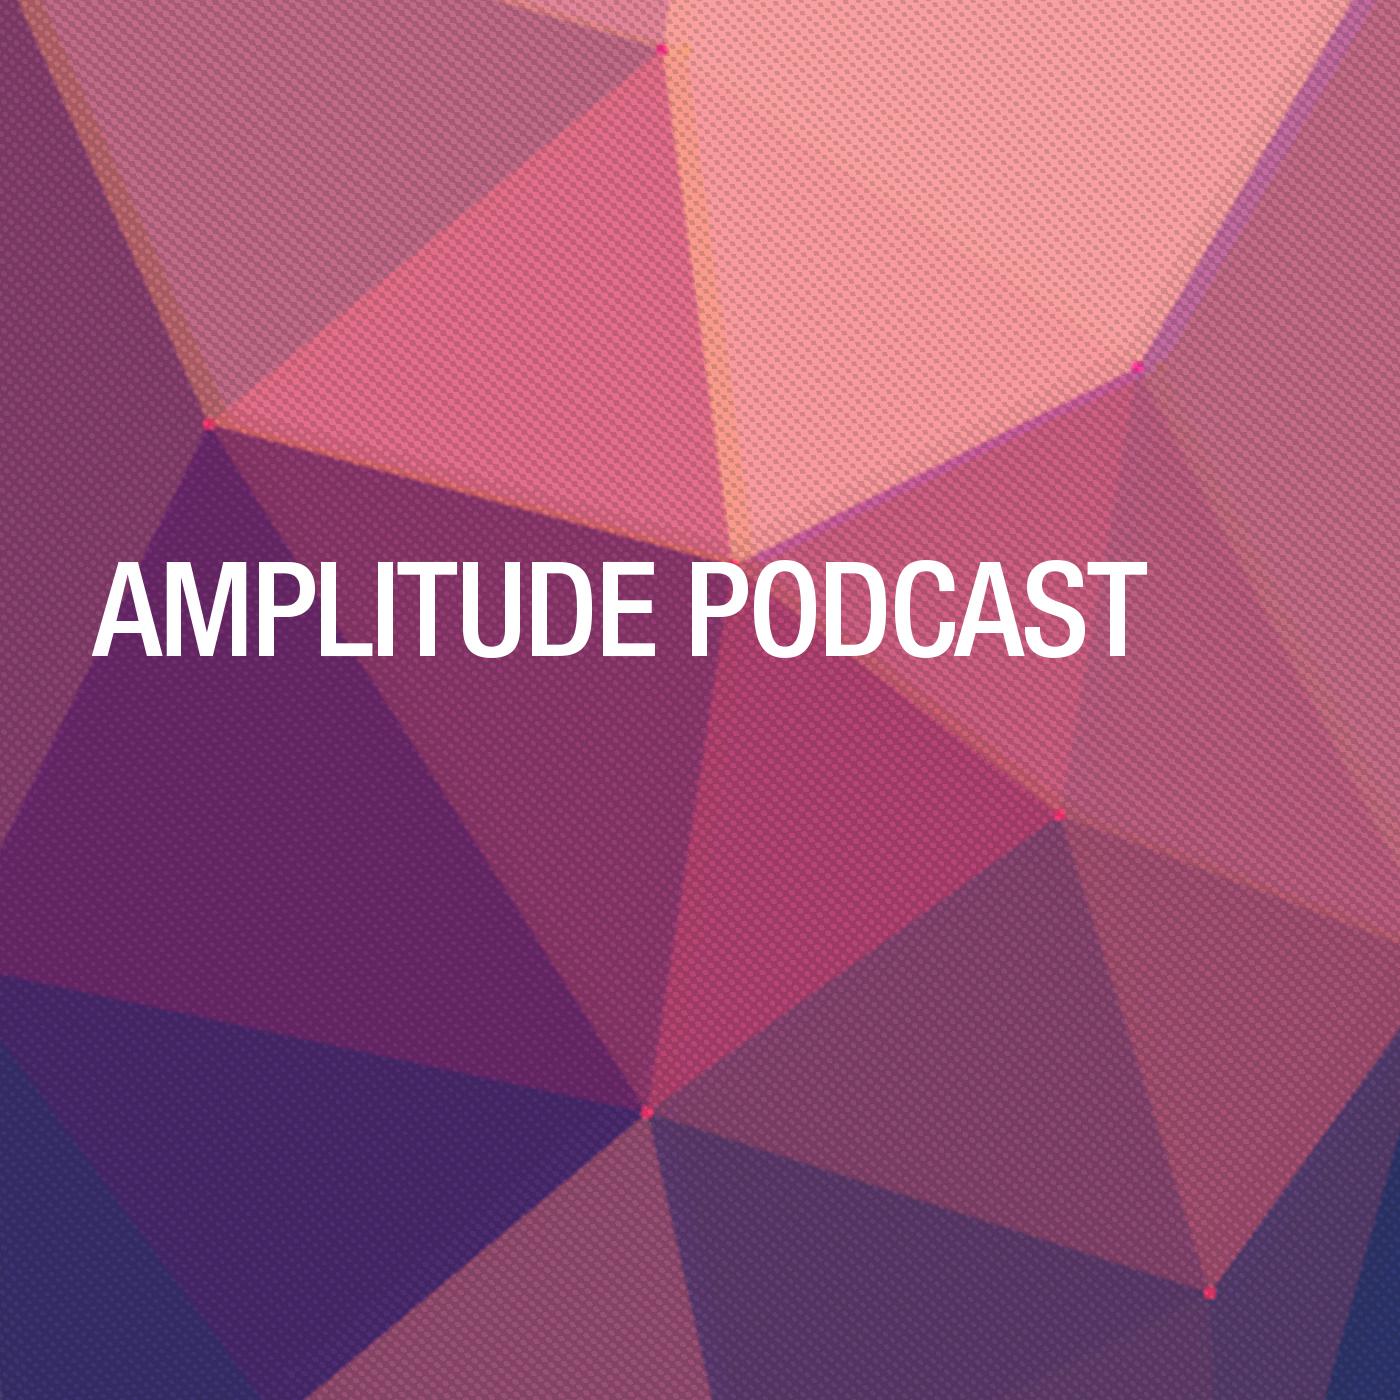 Amplitude Podcast